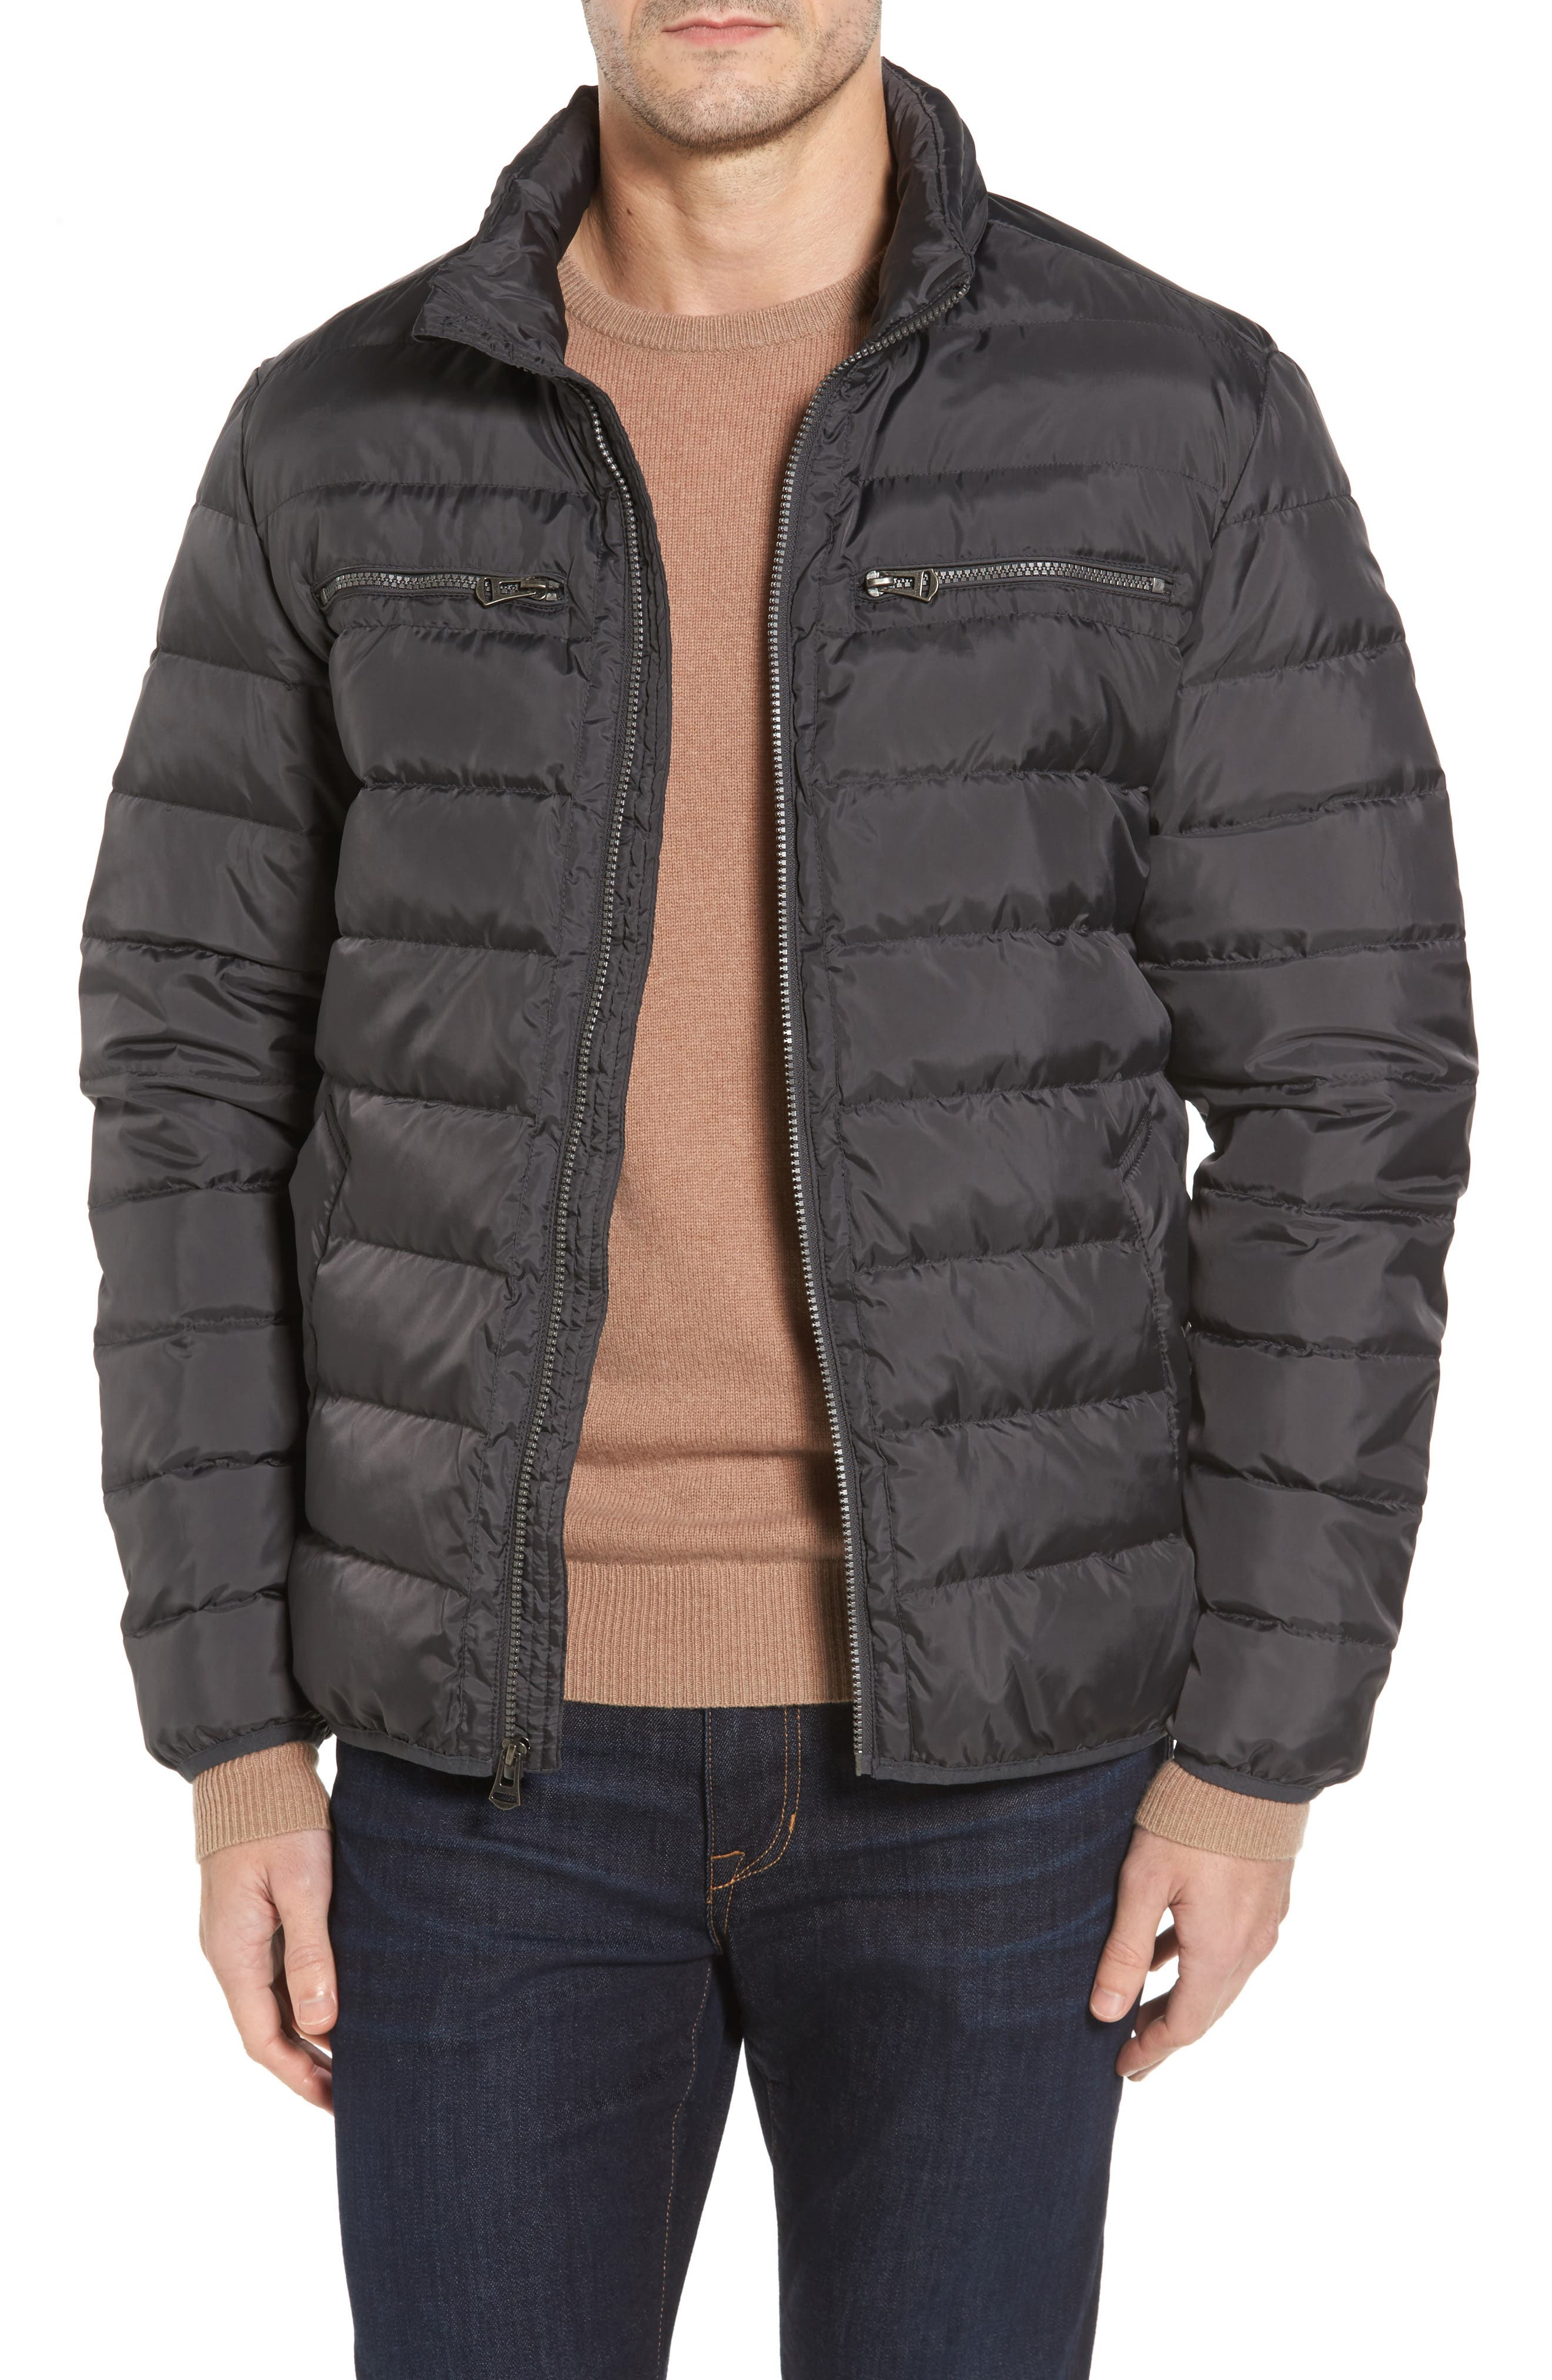 Alternate Image 1 Selected - Cole Haan Packable Down Jacket